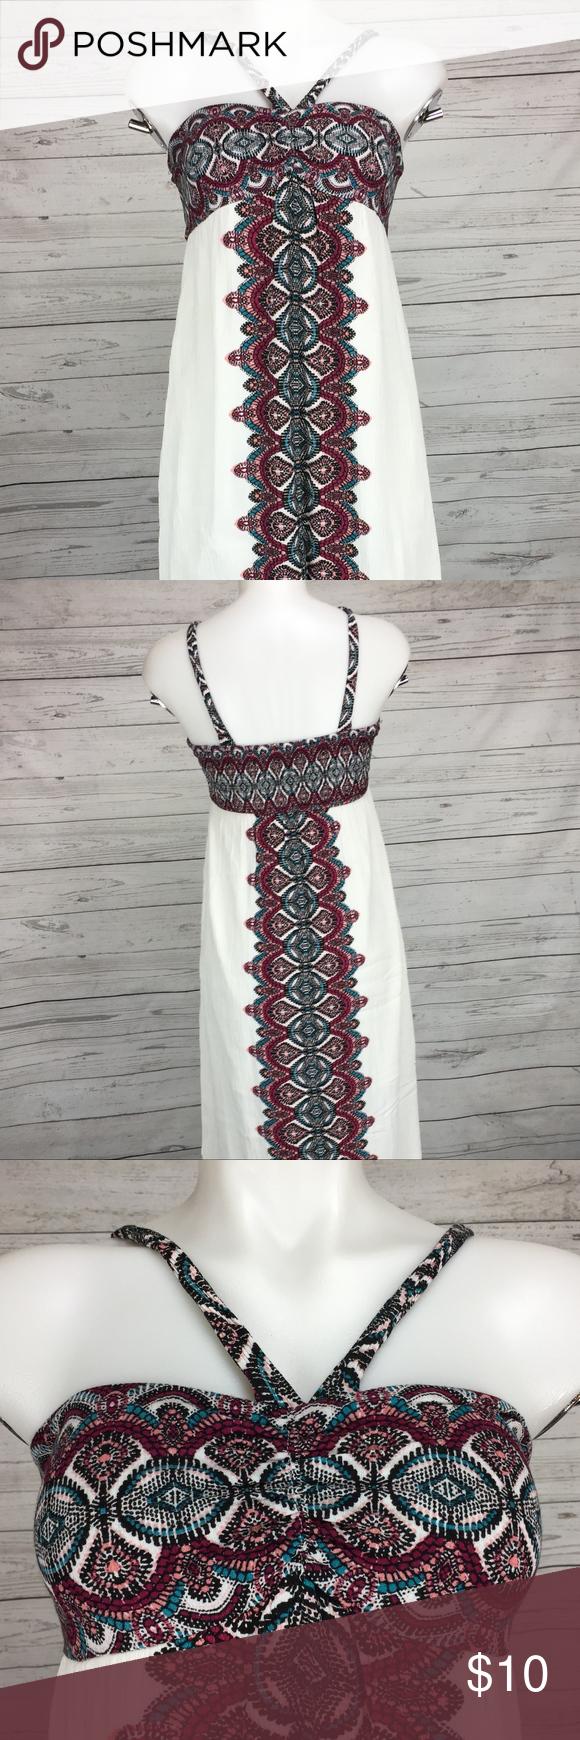 70e3985a6c6 Xhilaration Dress M Maxi Boho Empire Waist Aztec Xhilaration Womens Dress  Maxi Boho Empire Waist Aztec Sleeveless Summer Size  Medium Color   Multi-Color ...